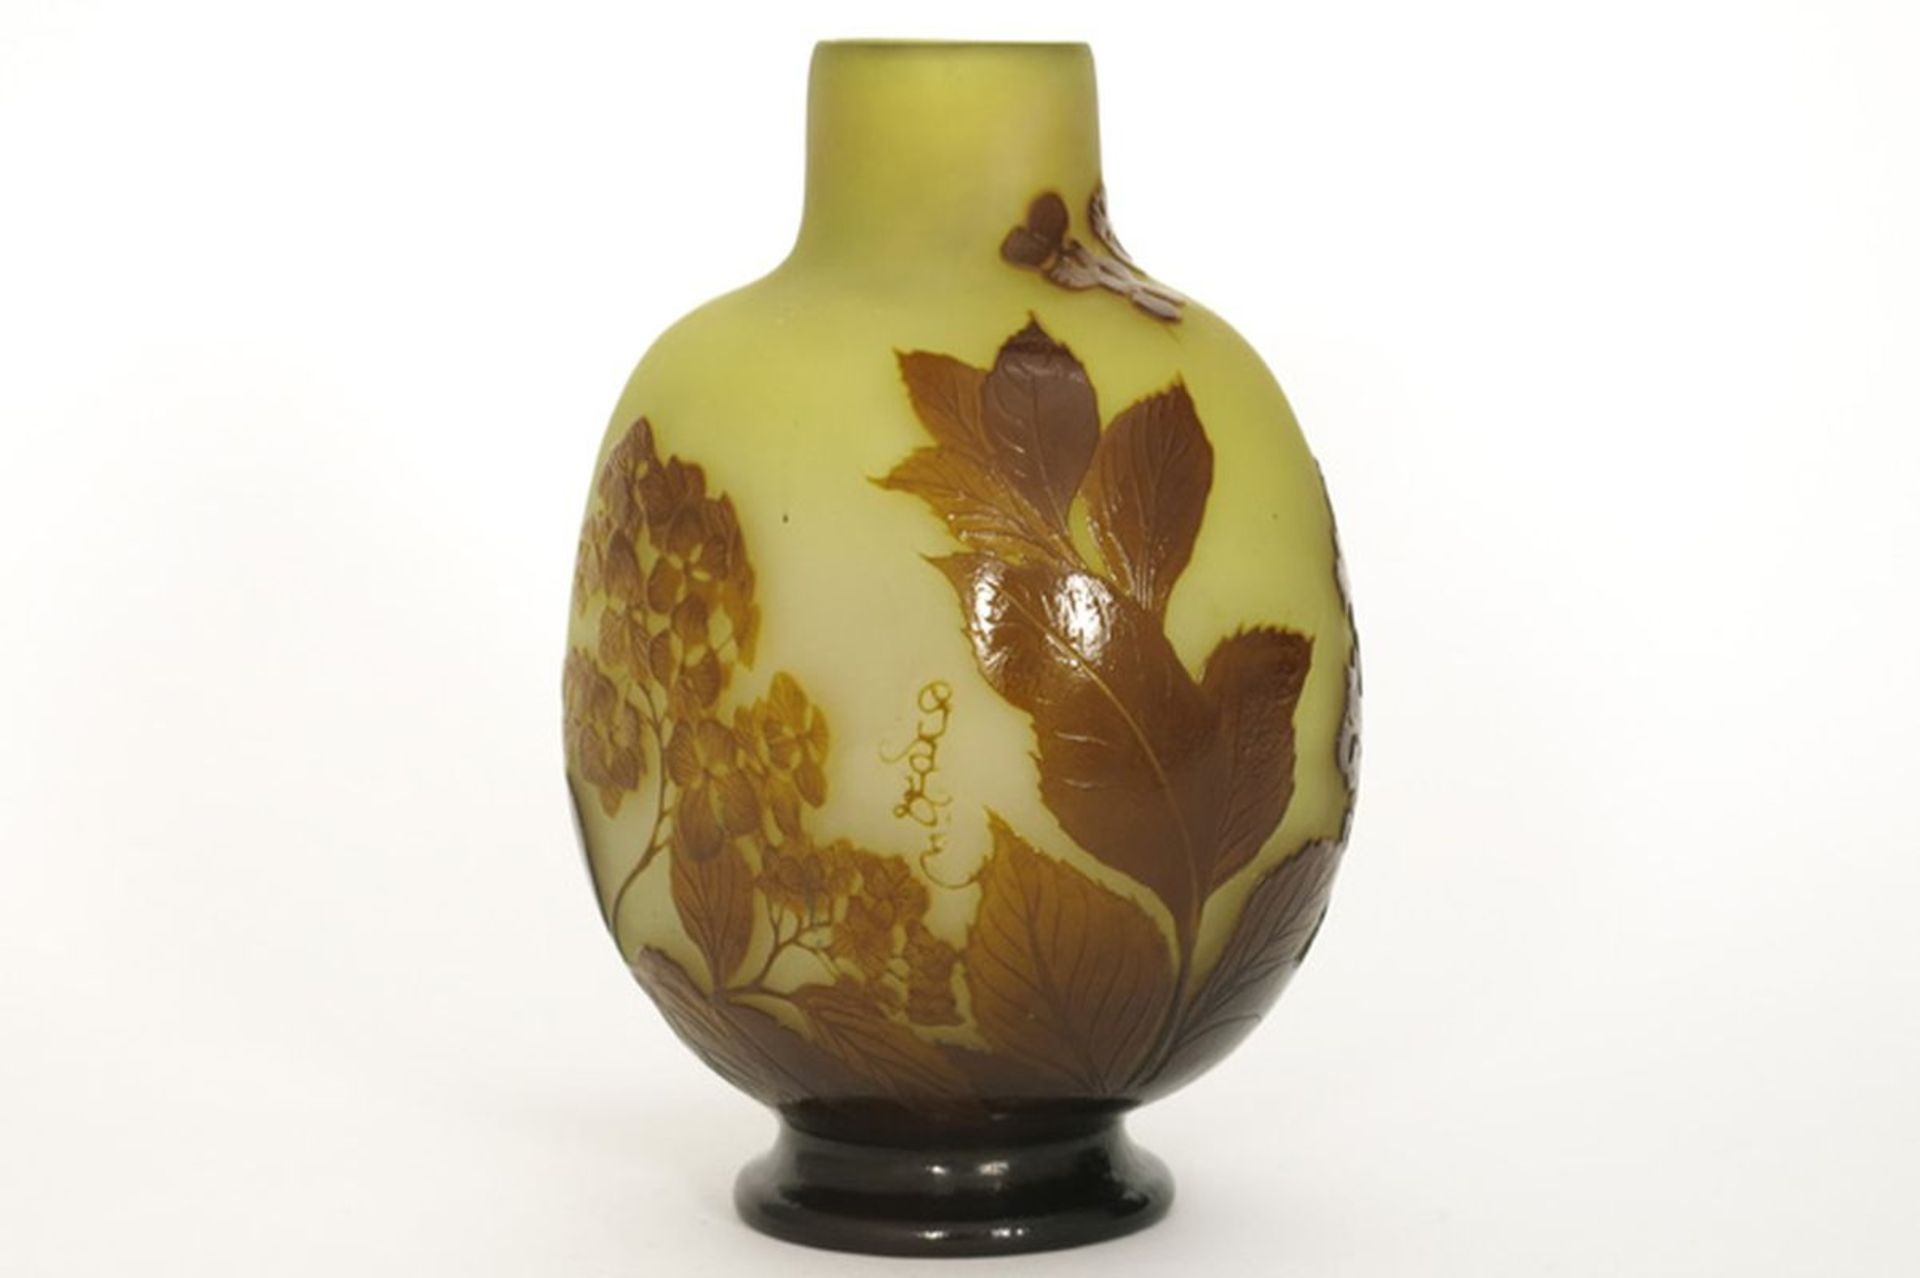 Los 603 - GALLÉ ÉMILE (1846 - 1904) Art Nouveau-vaas in meerlagige cameo-glaspasta met een [...]